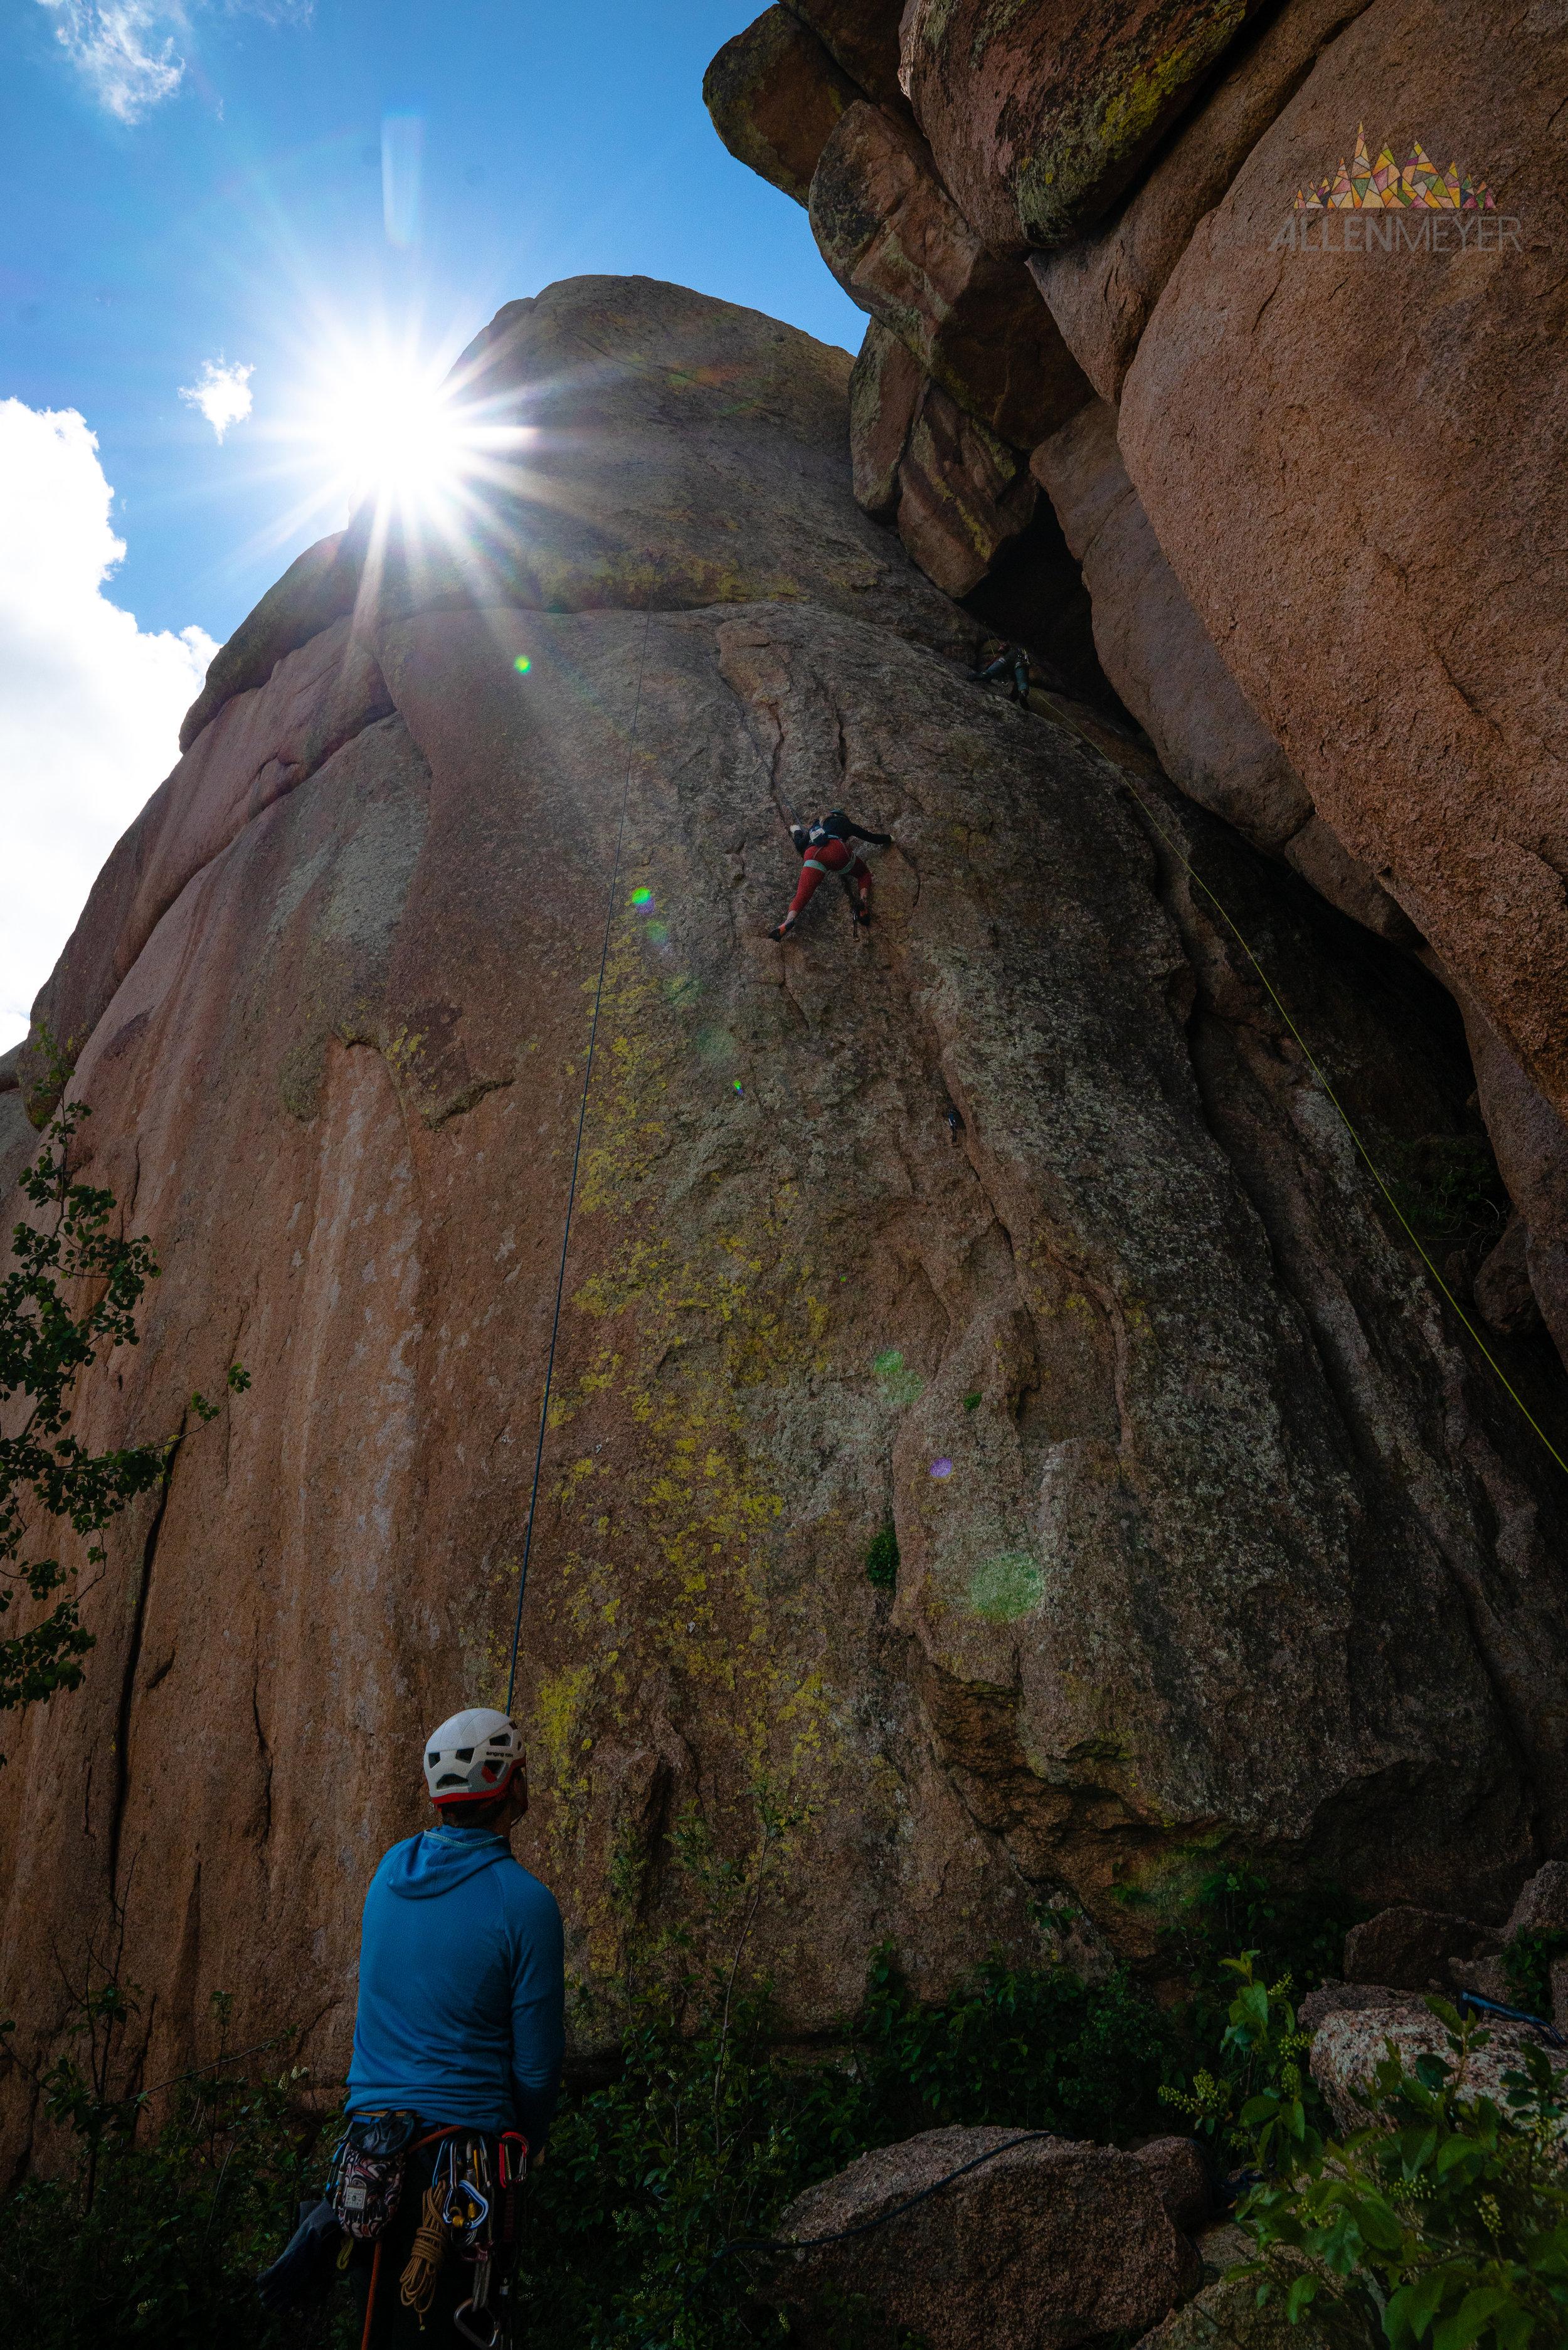 Outdoor Adventures In Cheyenne, Wyoming; Photography by Allen Meyer-04678.jpg